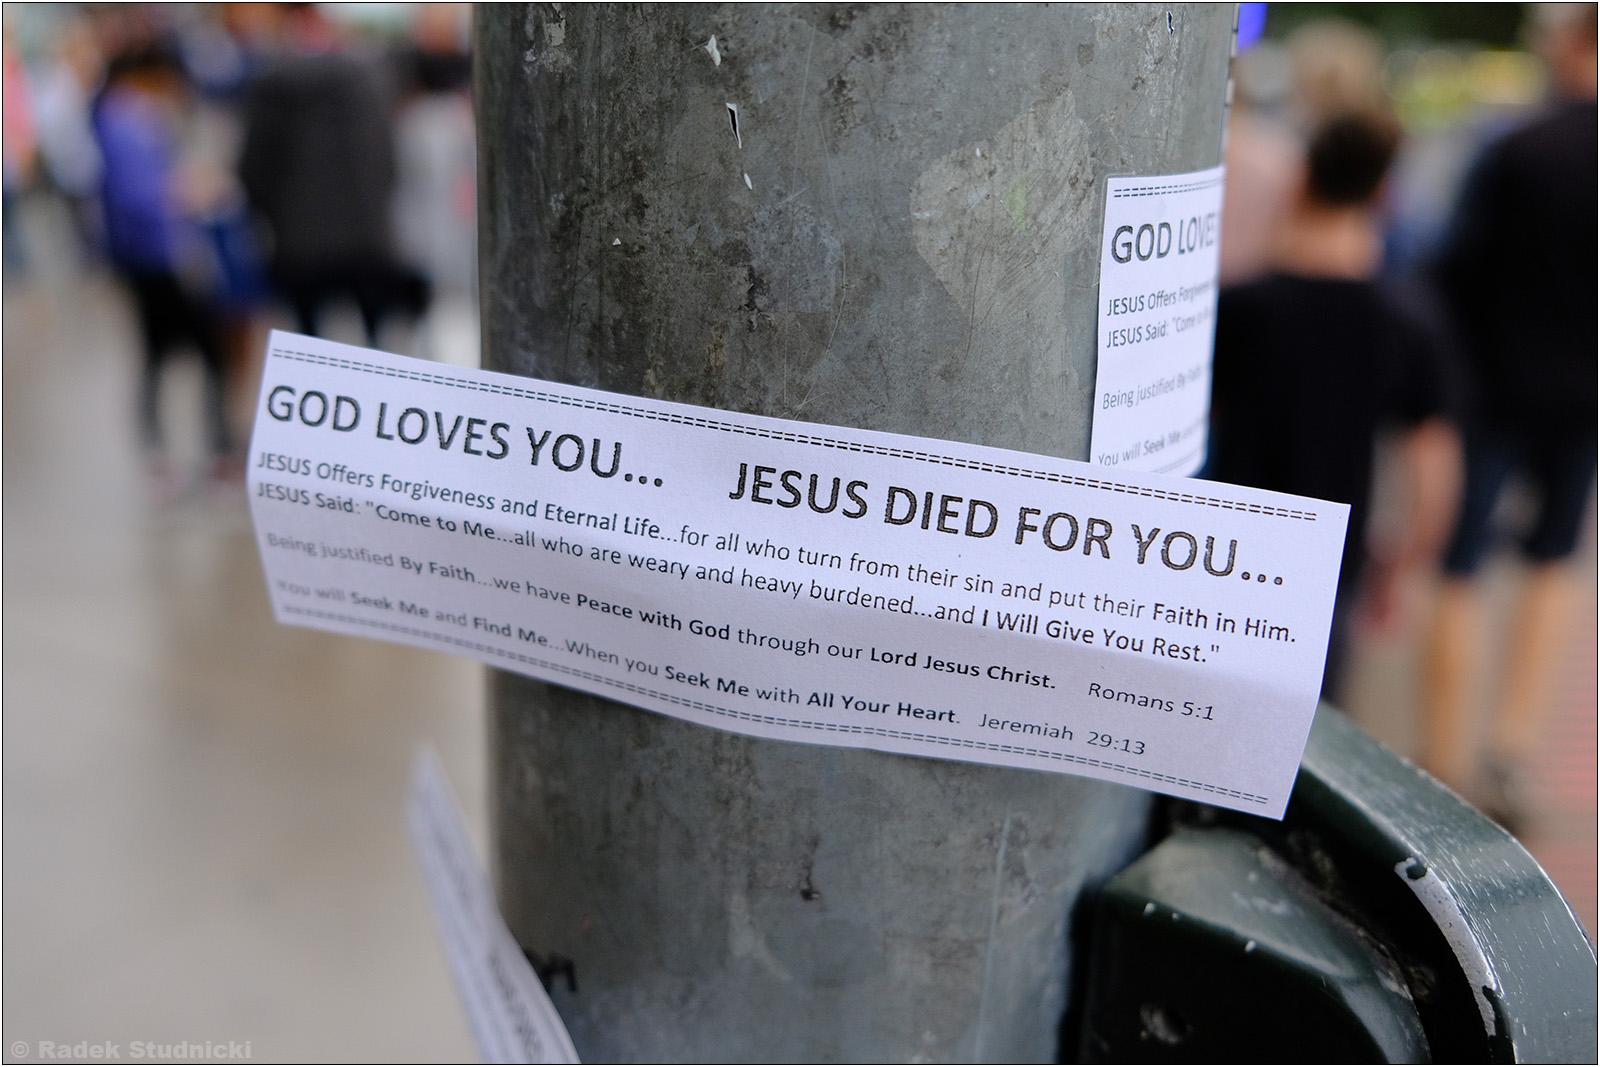 Bóg Cię kocha w Vegas